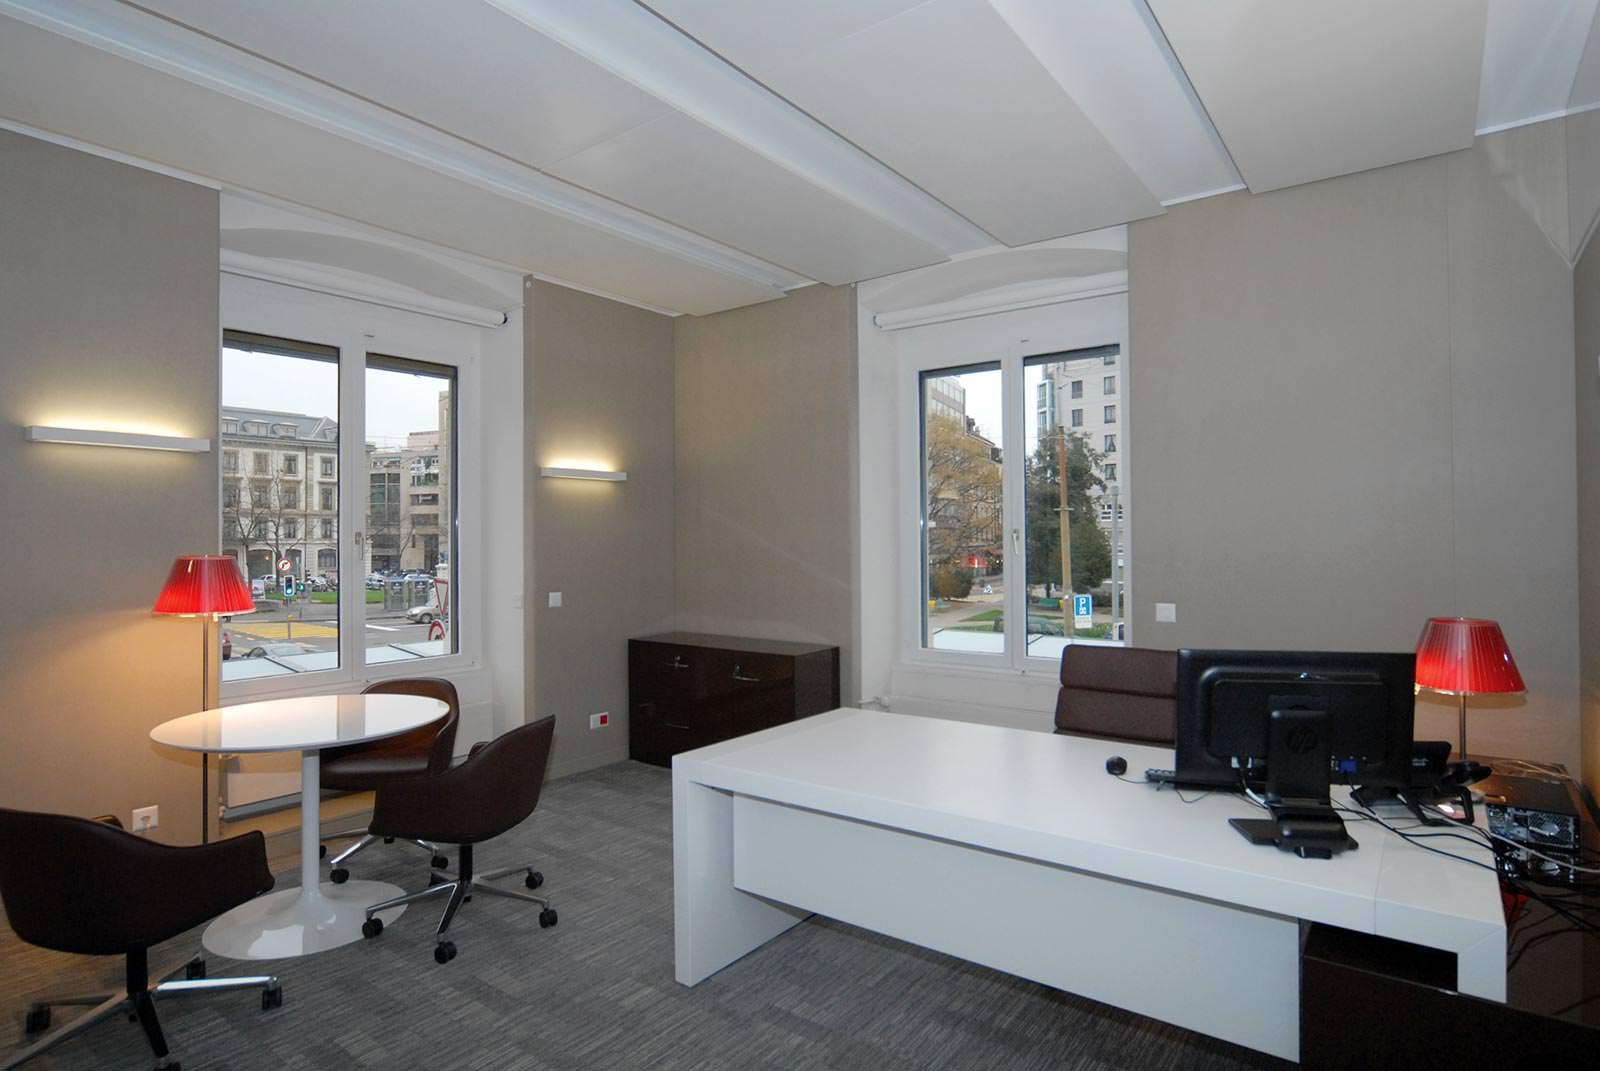 Atelier Philippe JAMMET Architecte Grenoble Lyon